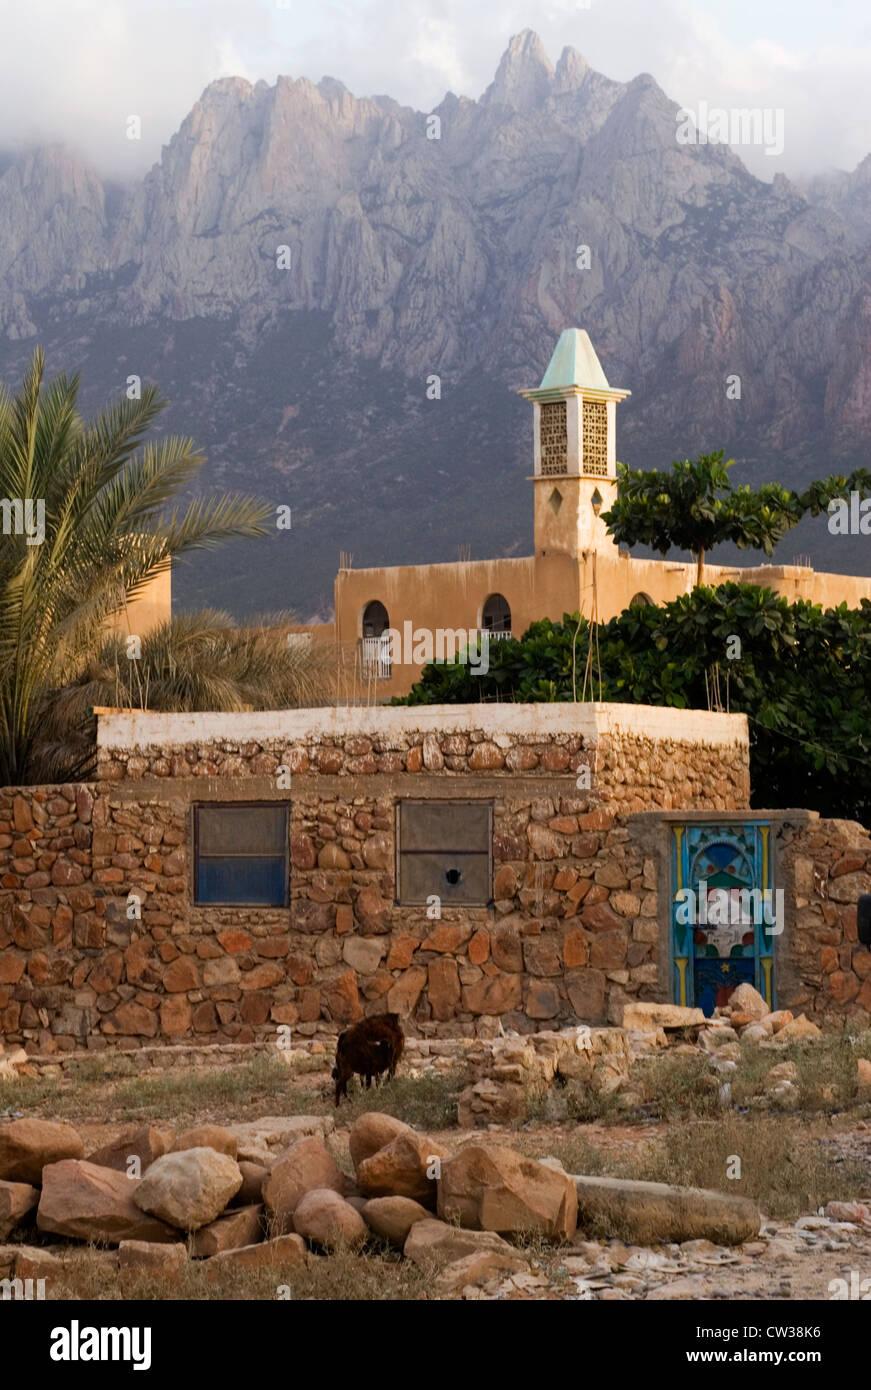 The Village of Hadibo, Socotra Island, Yemen,  Western Asia, Arabian Peninsula. - Stock Image